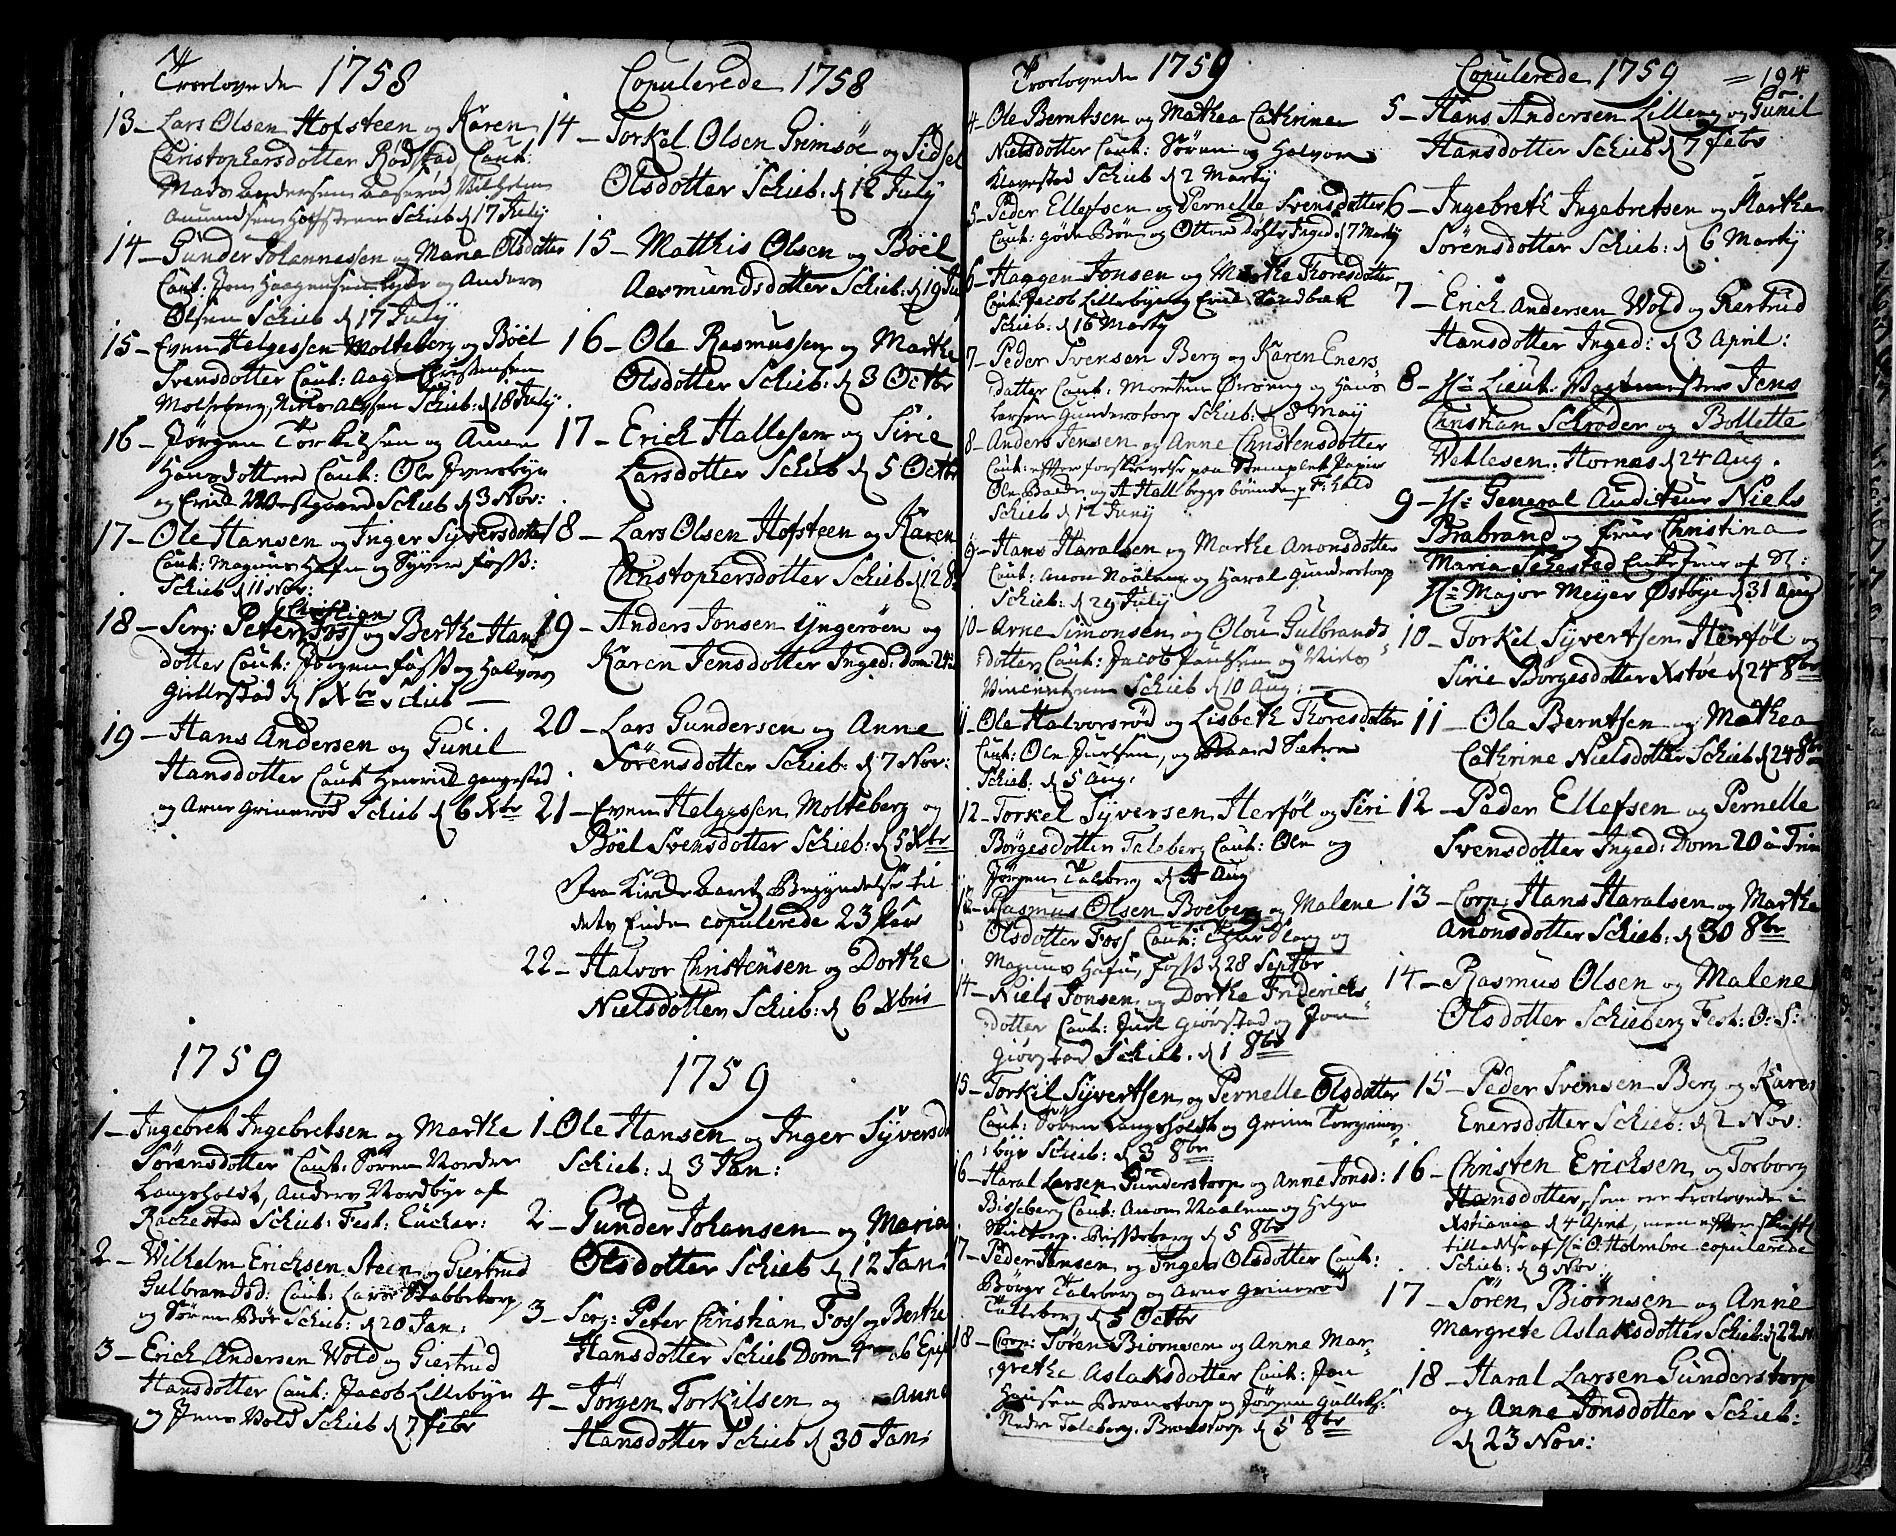 SAO, Skjeberg prestekontor Kirkebøker, F/Fa/L0002: Parish register (official) no. I 2, 1726-1791, p. 194